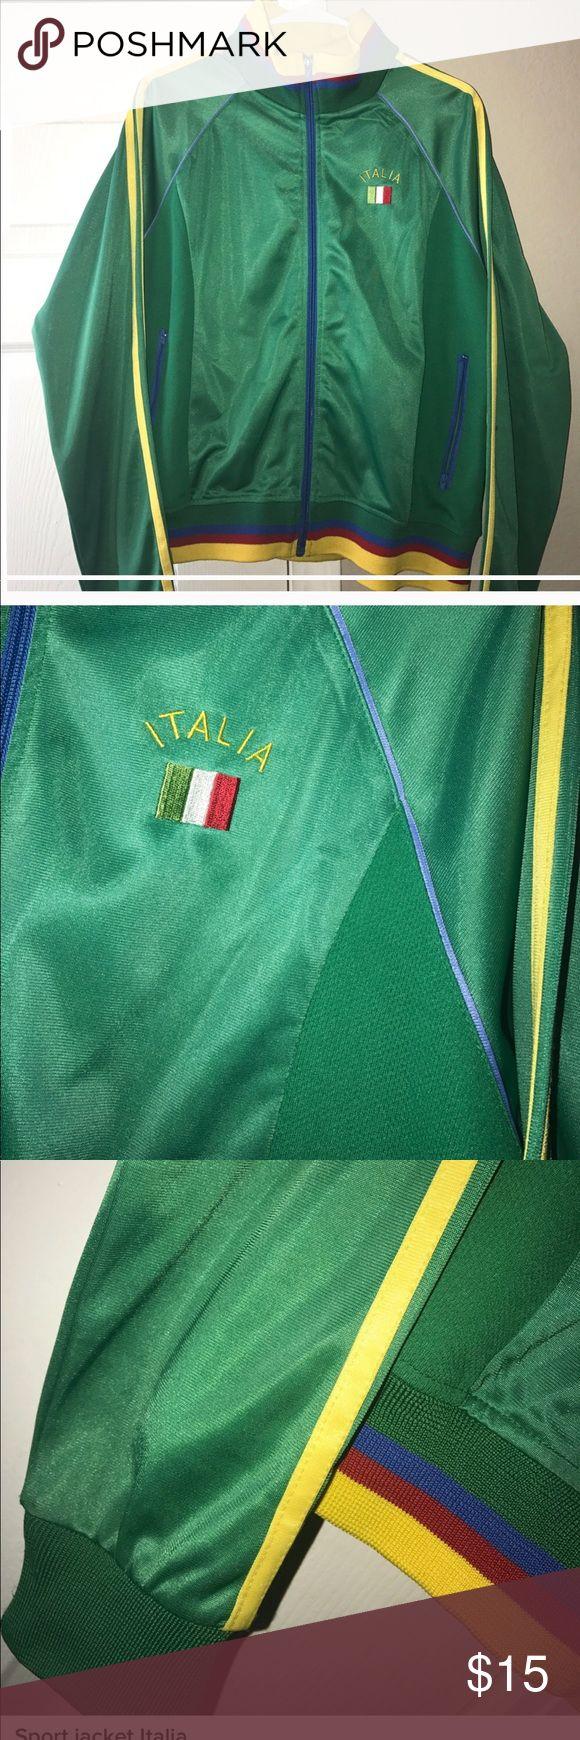 Sports Jacket Italia Track jacket, sports jacket, red green blue yellow, Italian flag, size xl but fits like large, long sleeve Jackets & Coats